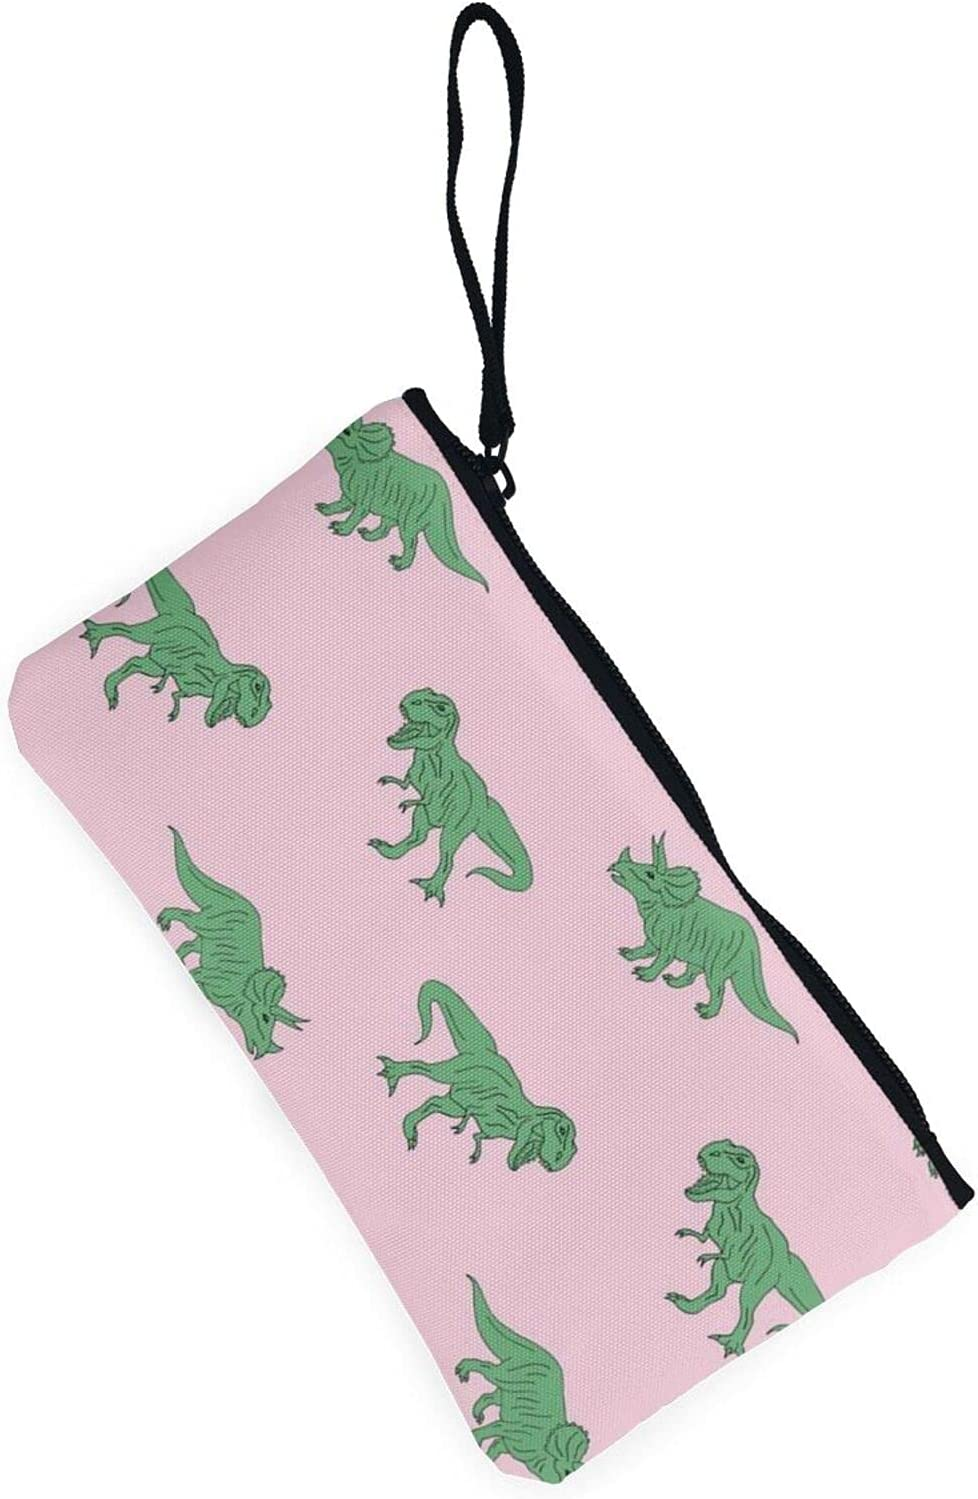 AORRUAM Pink background with dinos Canvas Coin Purse,Canvas Zipper Pencil Cases,Canvas Change Purse Pouch Mini Wallet Coin Bag